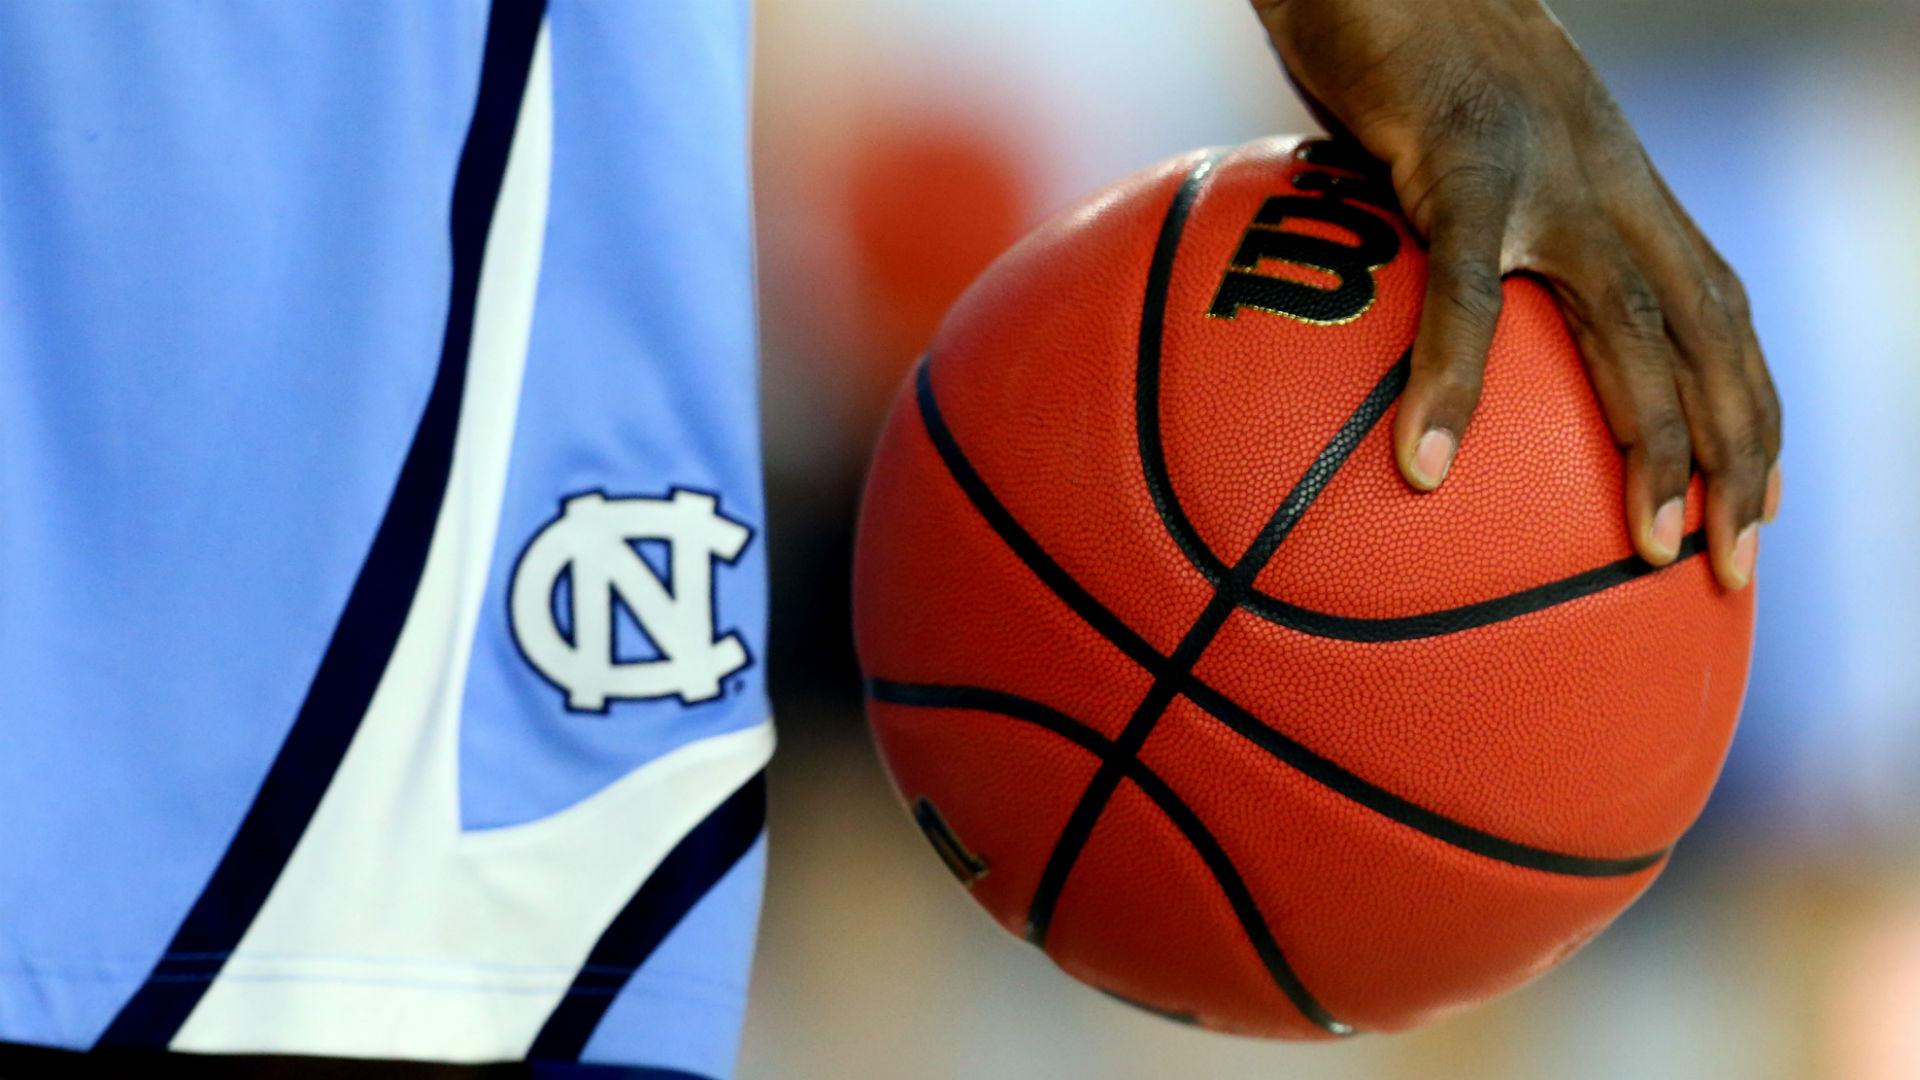 North Carolina lands 5-star center Walker Kessler